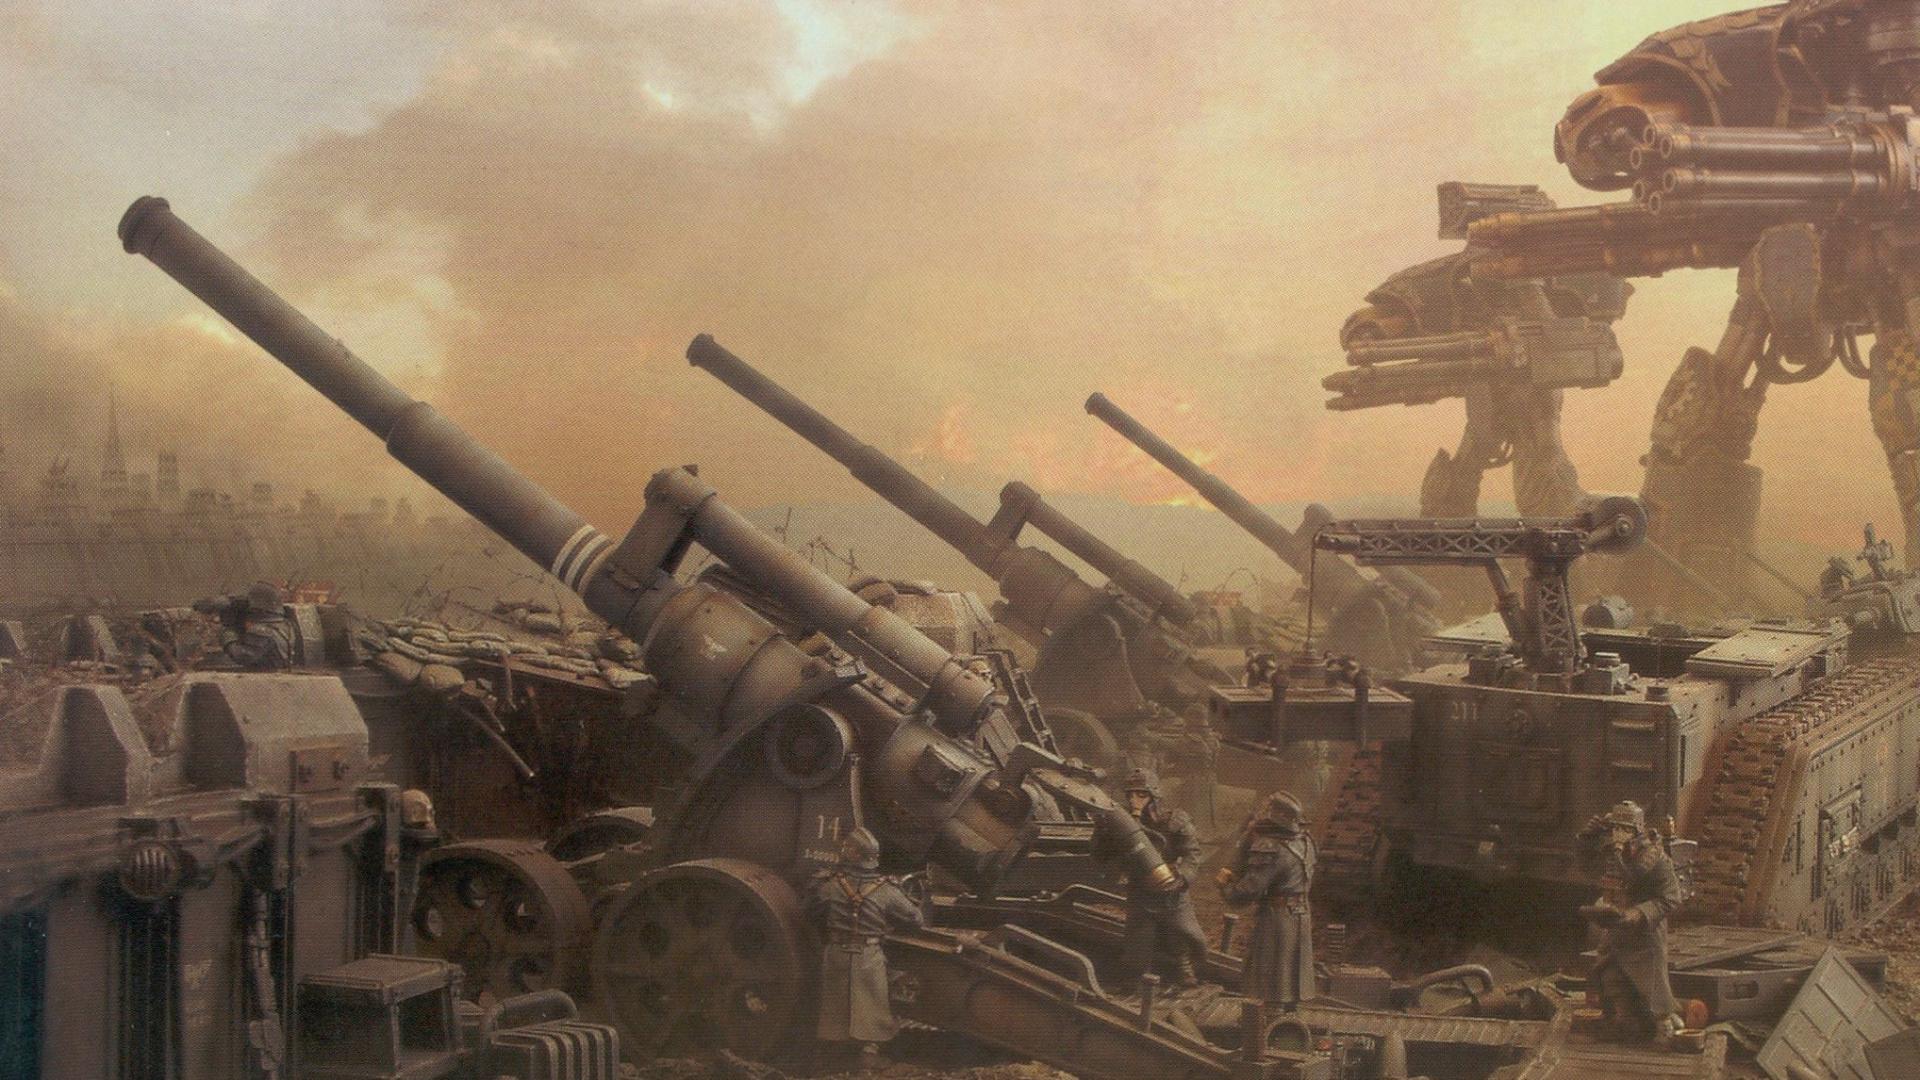 Free Download War Titans Tanks Imperial Guard Artillery Sci Fi